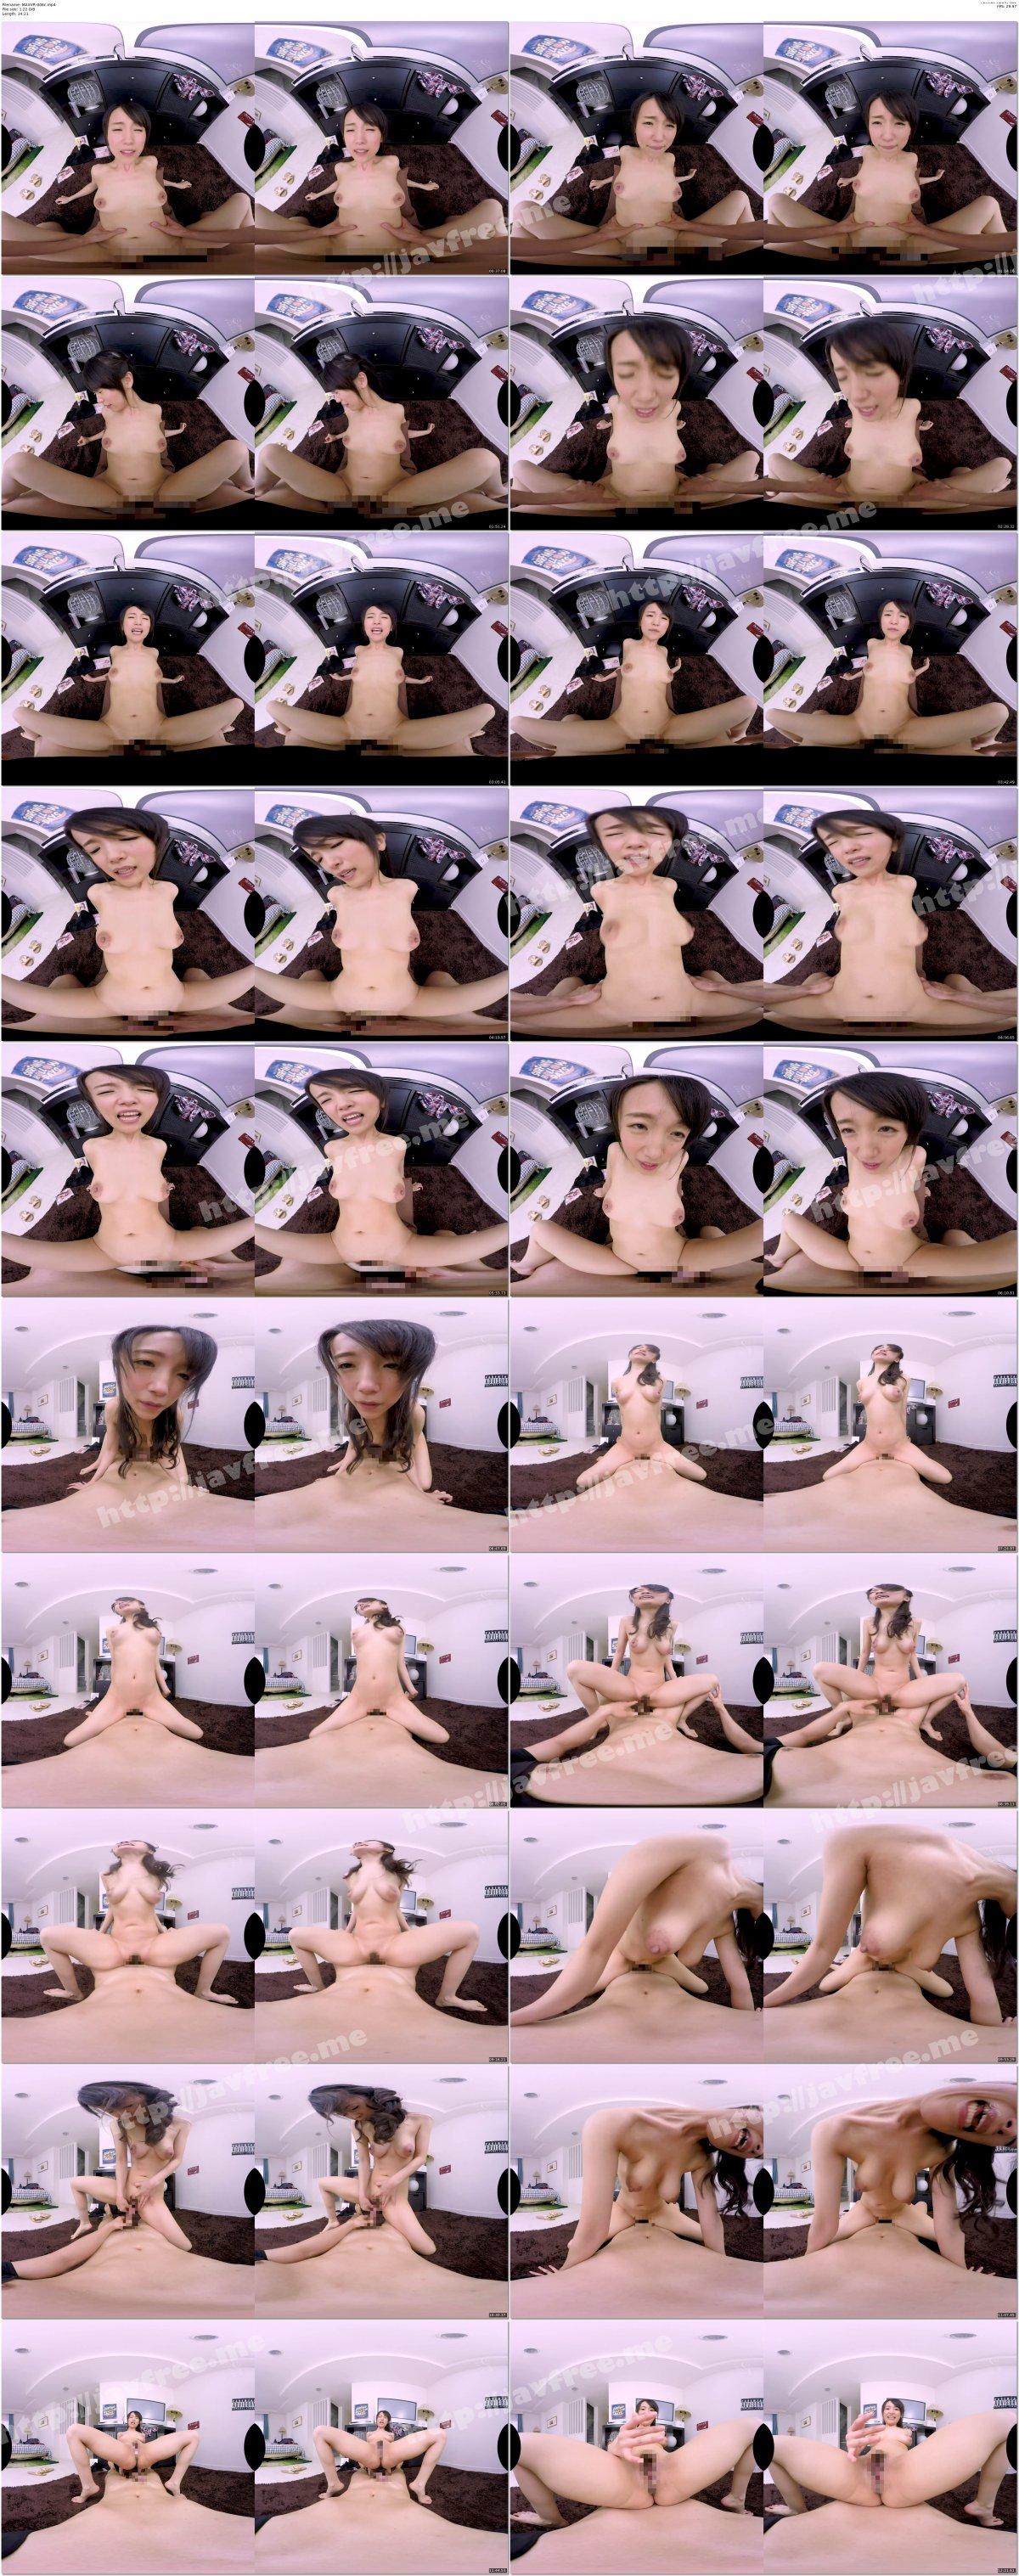 [MAXVR-006] 【VR】高画質 長瀬麻美がボクの家にやって来て生本番!目の前でハメ潮!中出しさせてくれました! - image MAXVR-006c on https://javfree.me